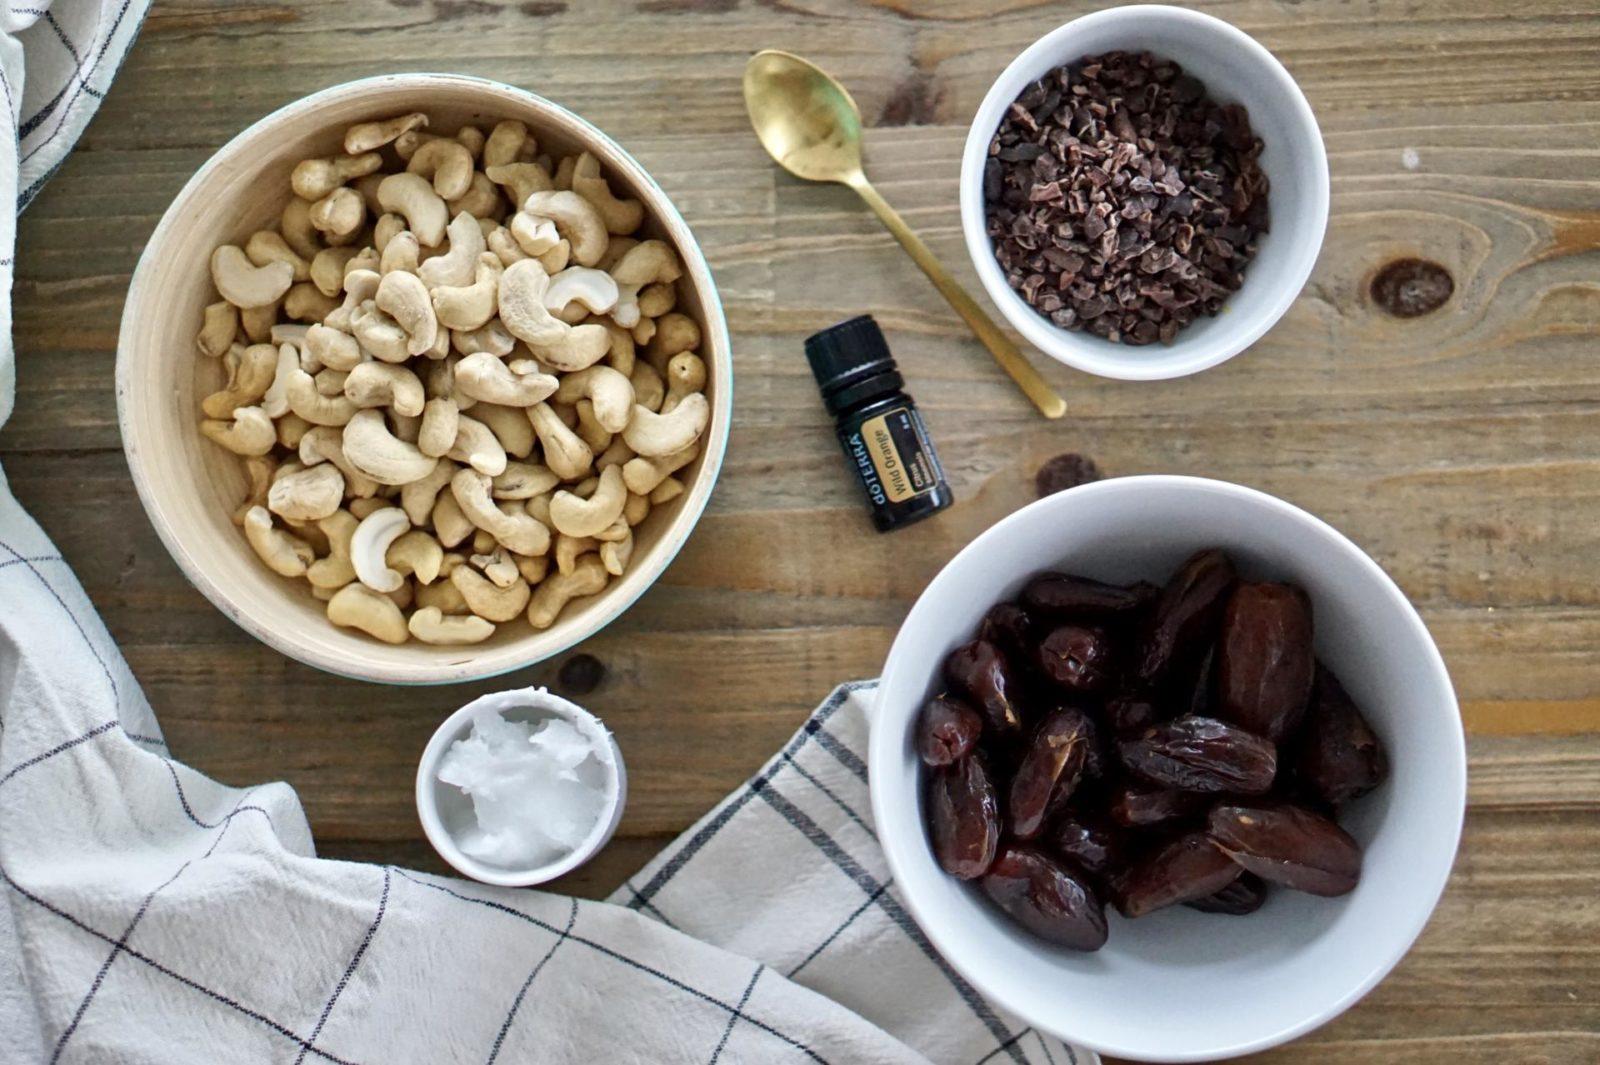 orange chocolate cashew nut balls leanmeanmomma